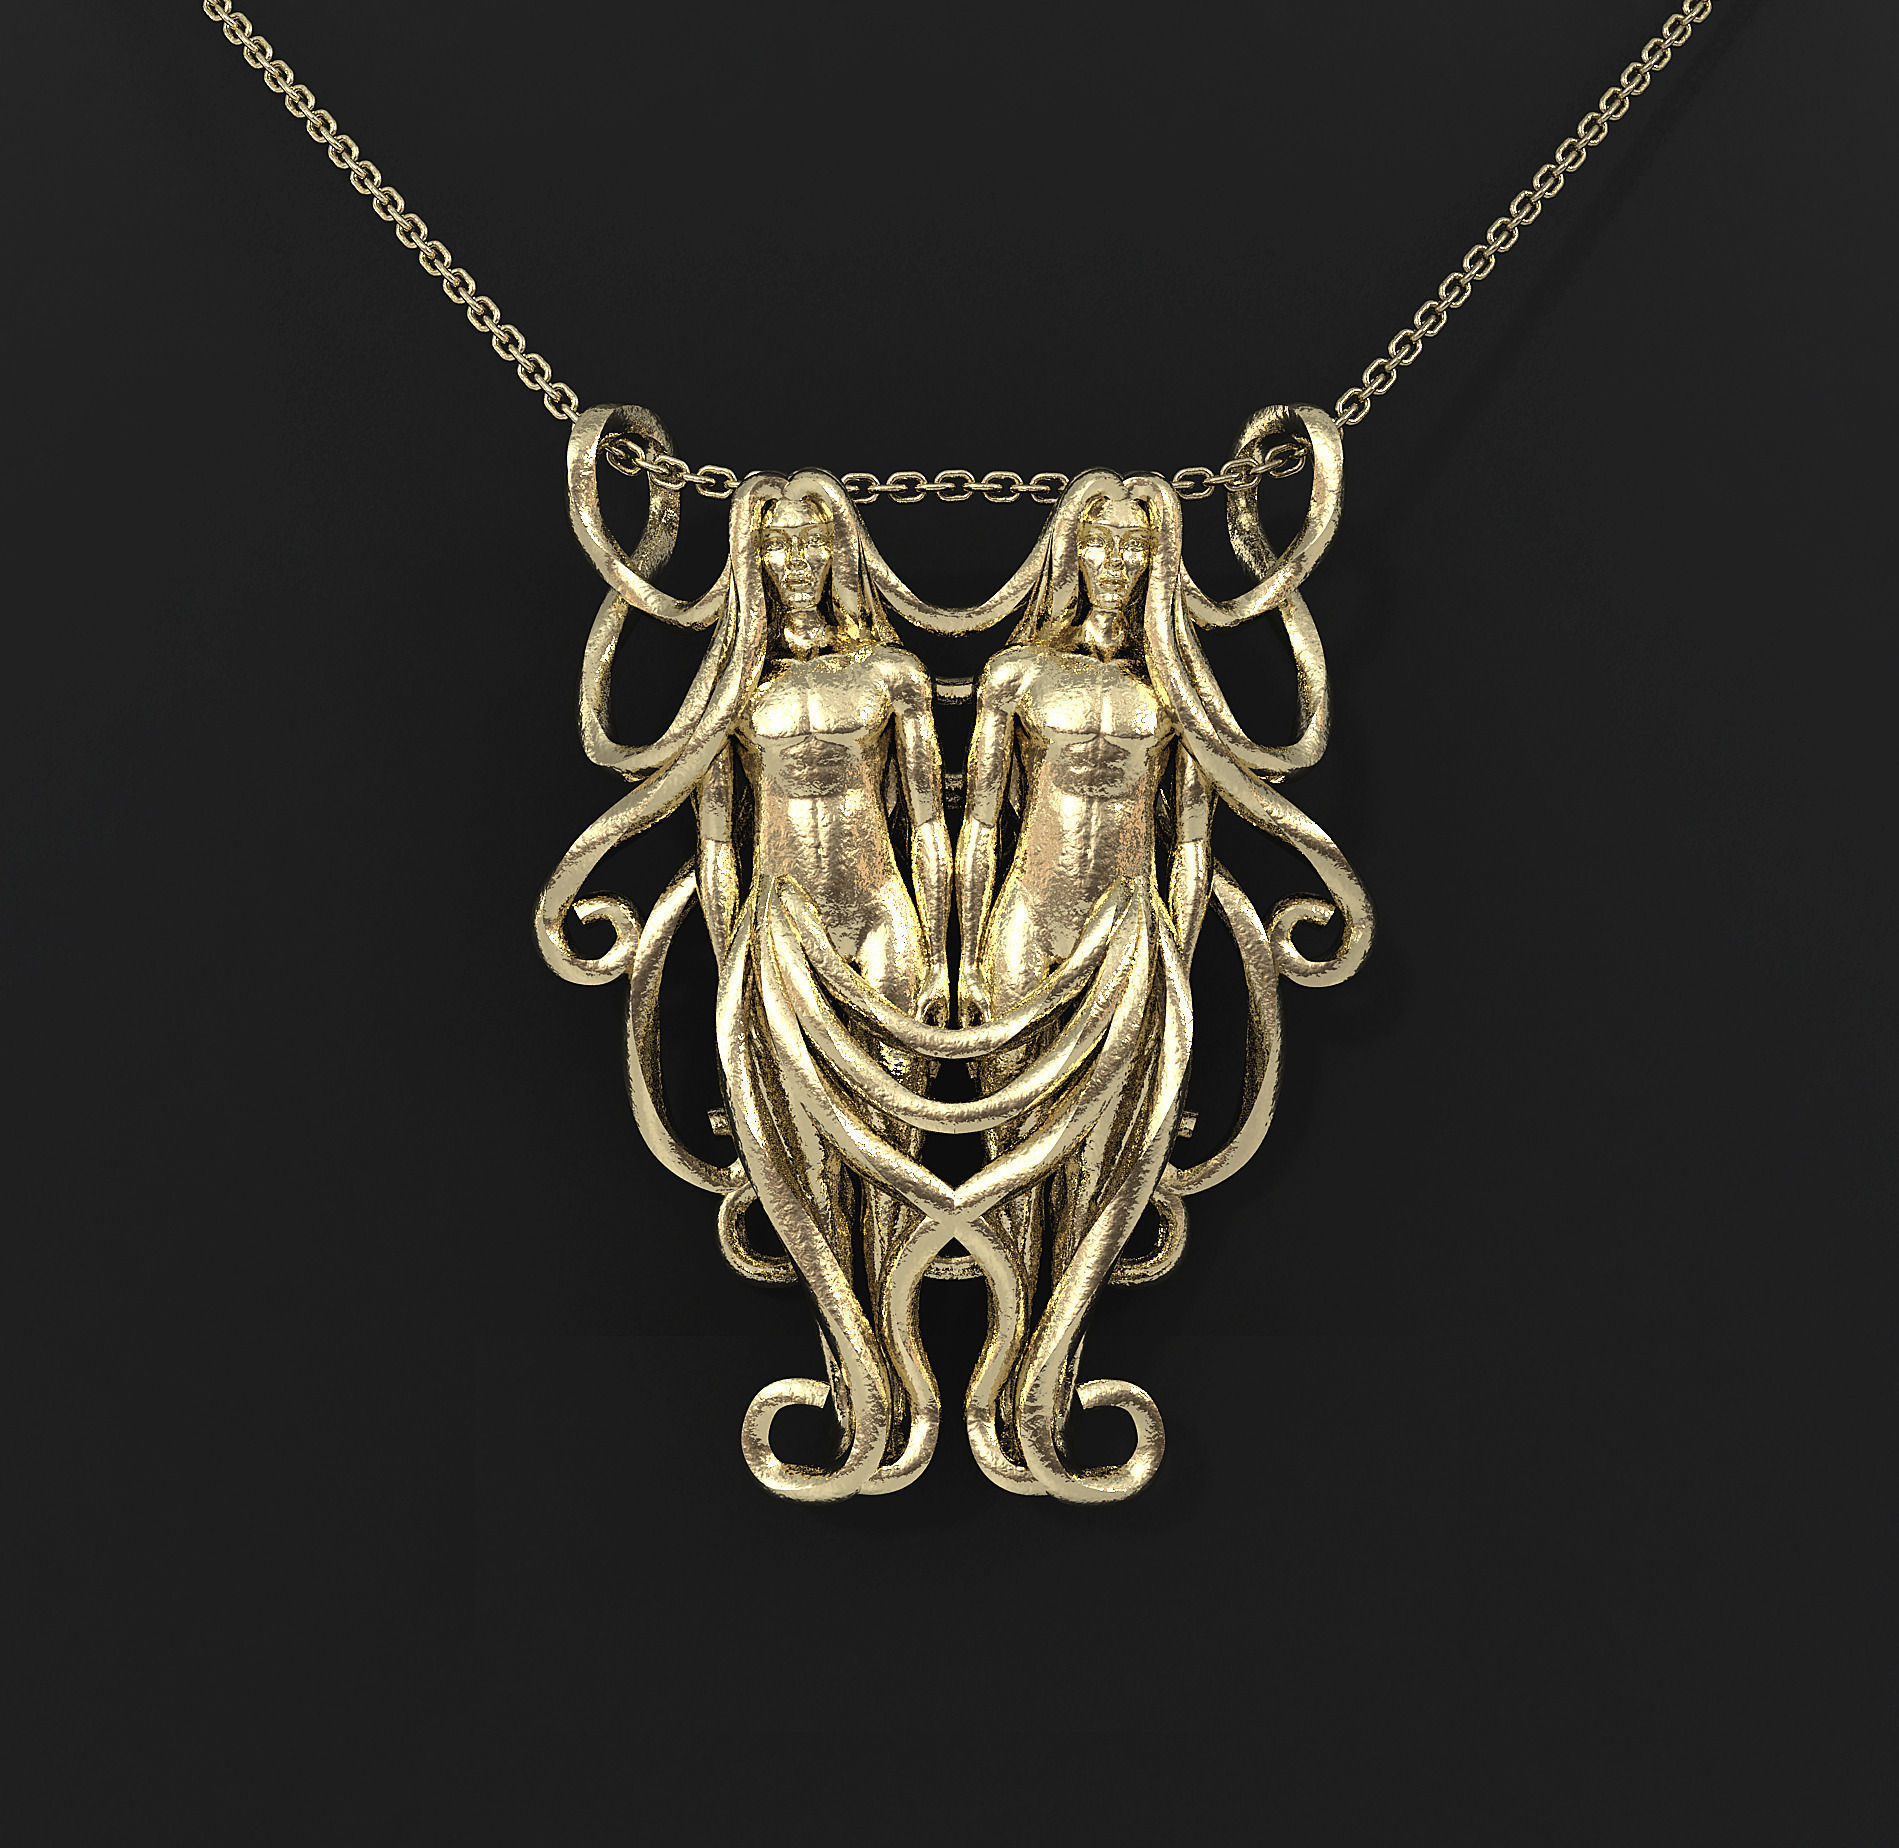 Gemini zodiac pendant 3d print model cgtrader gemini zodiac pendant 3d model stl 1 mozeypictures Gallery